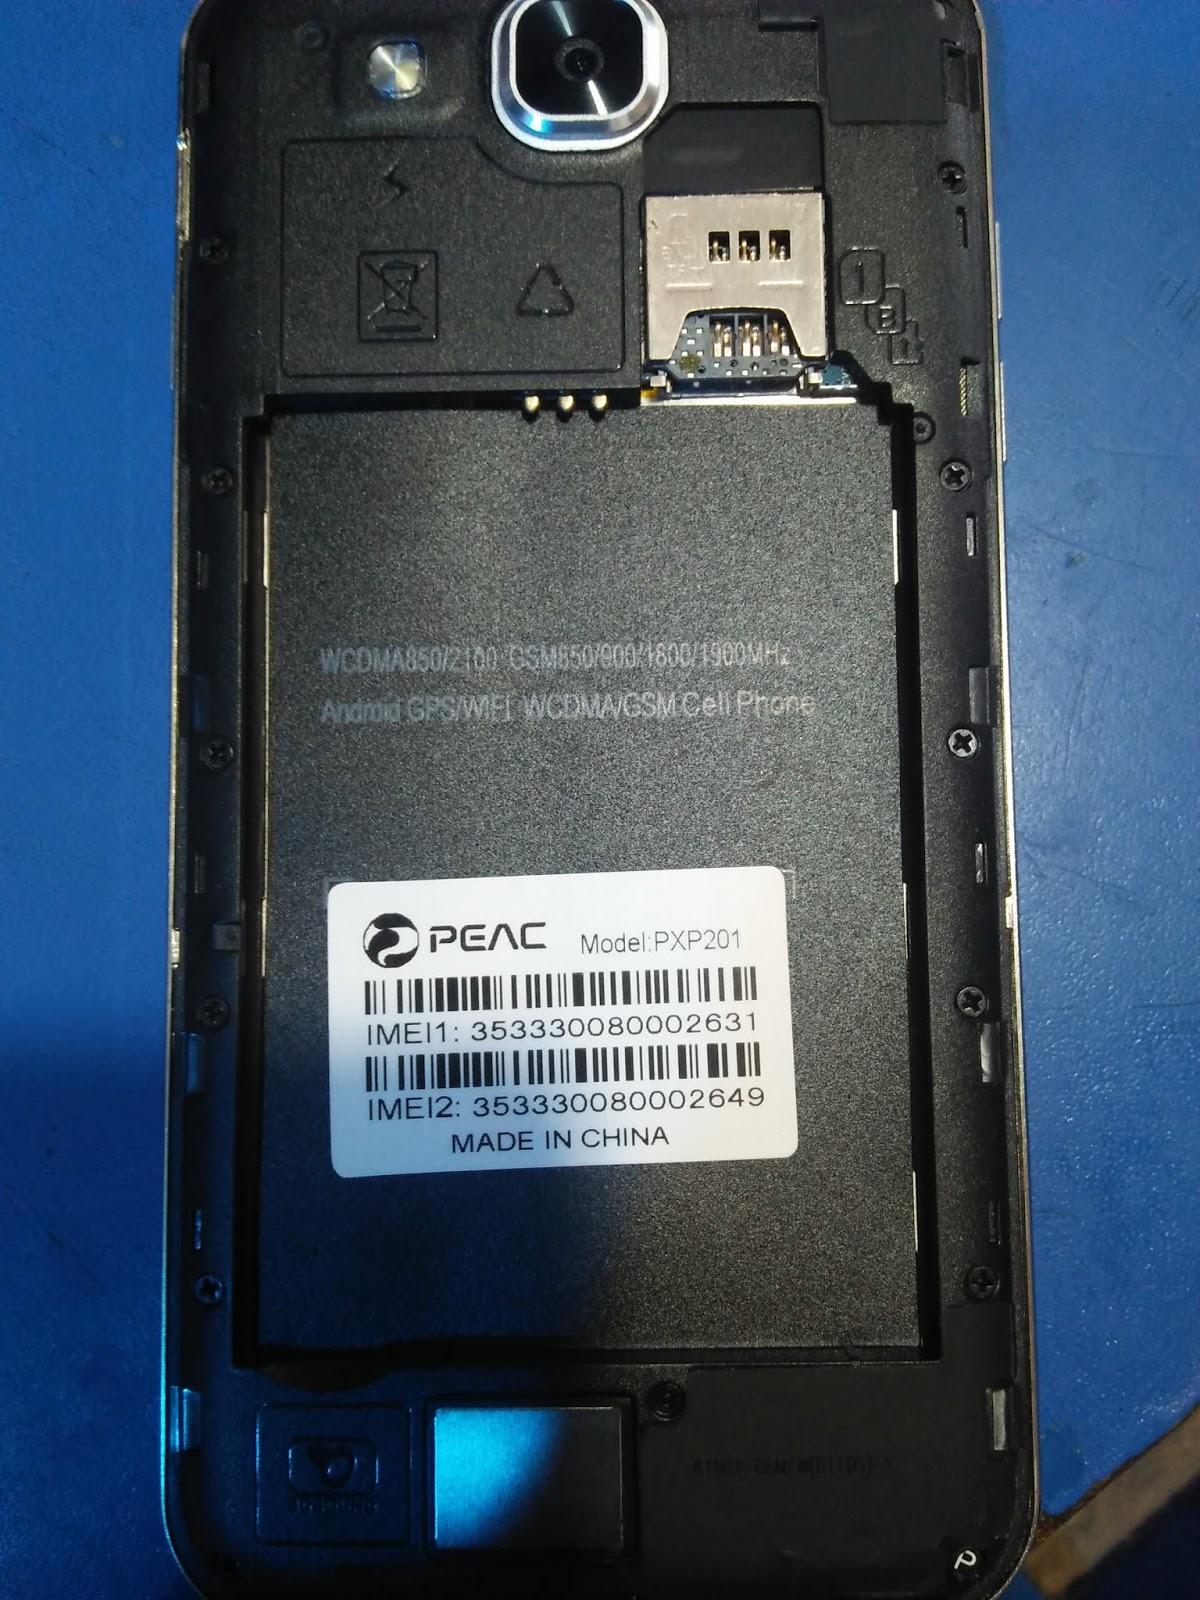 ™MK TelecomBD By Gsm Rokon: PEACE PXP201 MT6580 FIRMWARE